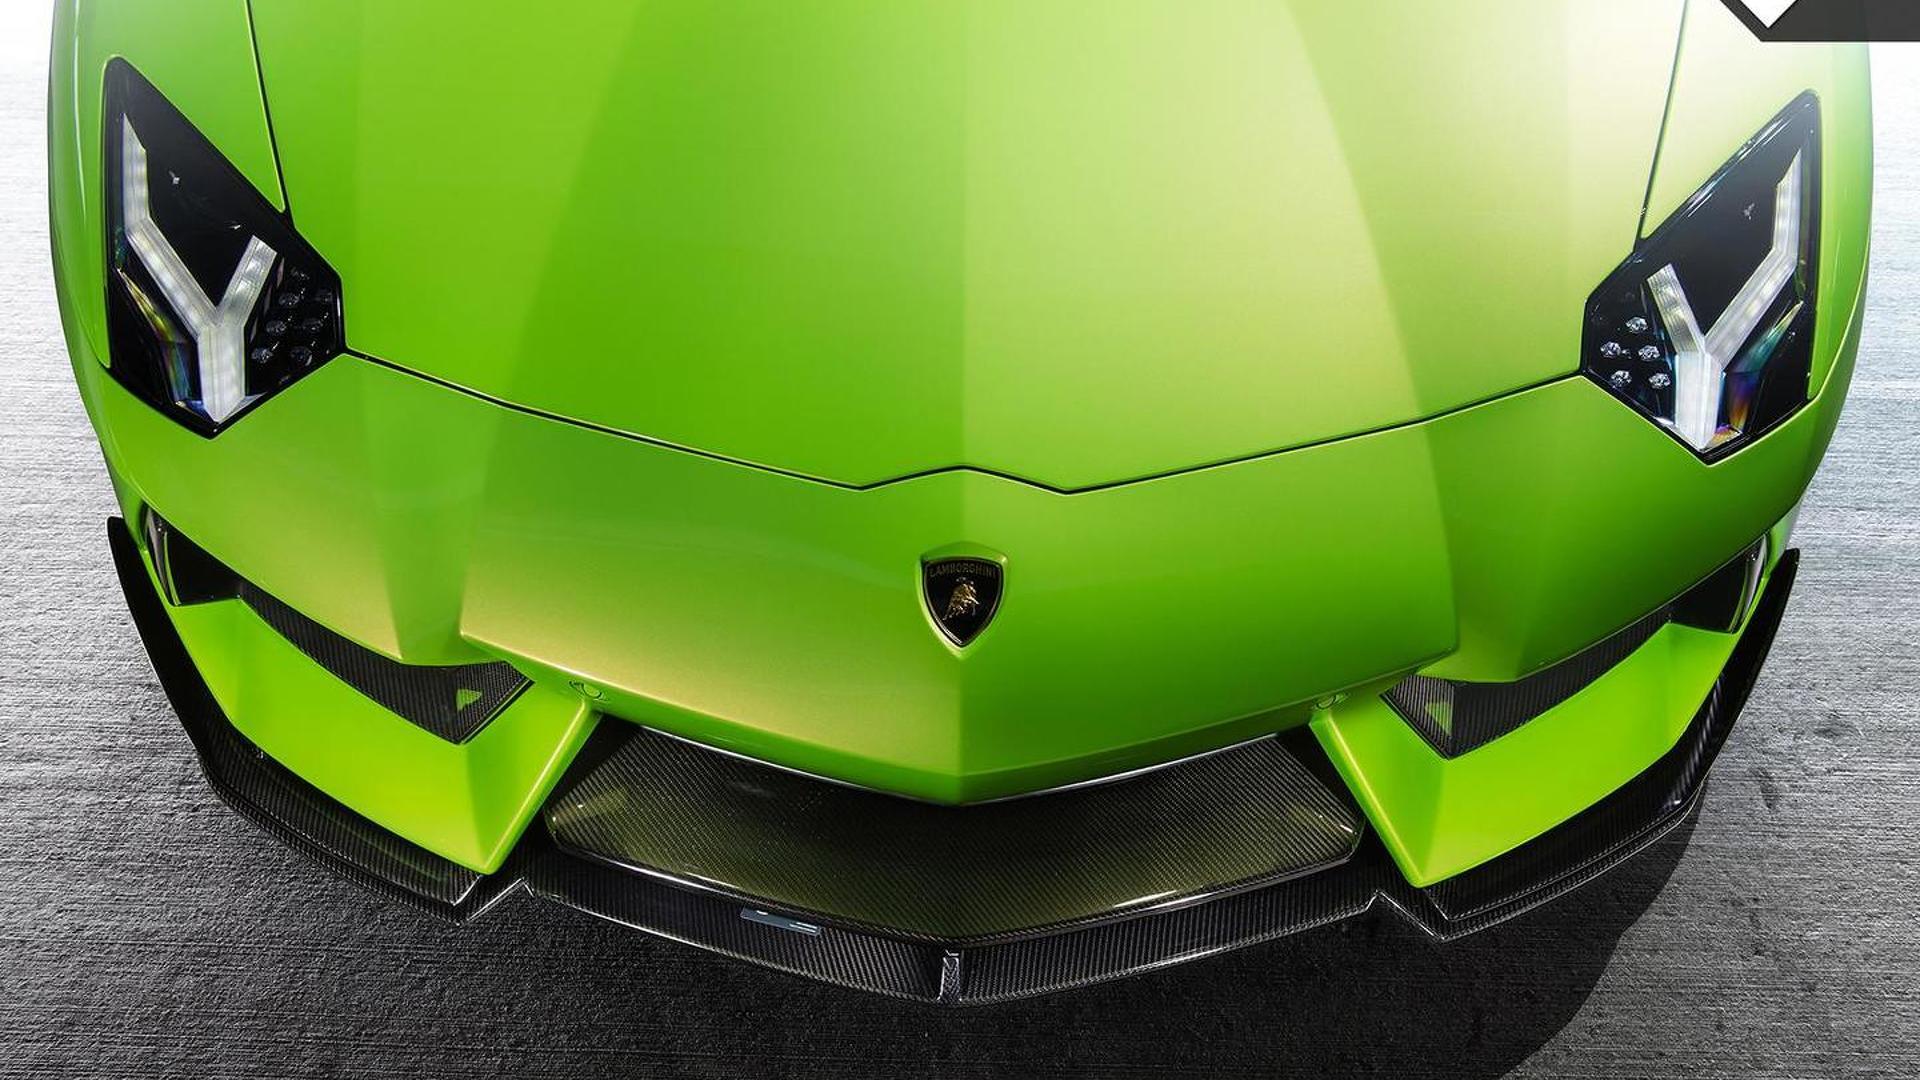 Карбоновый сплиттер Lamborghini Aventador-V Roadster The Hulk